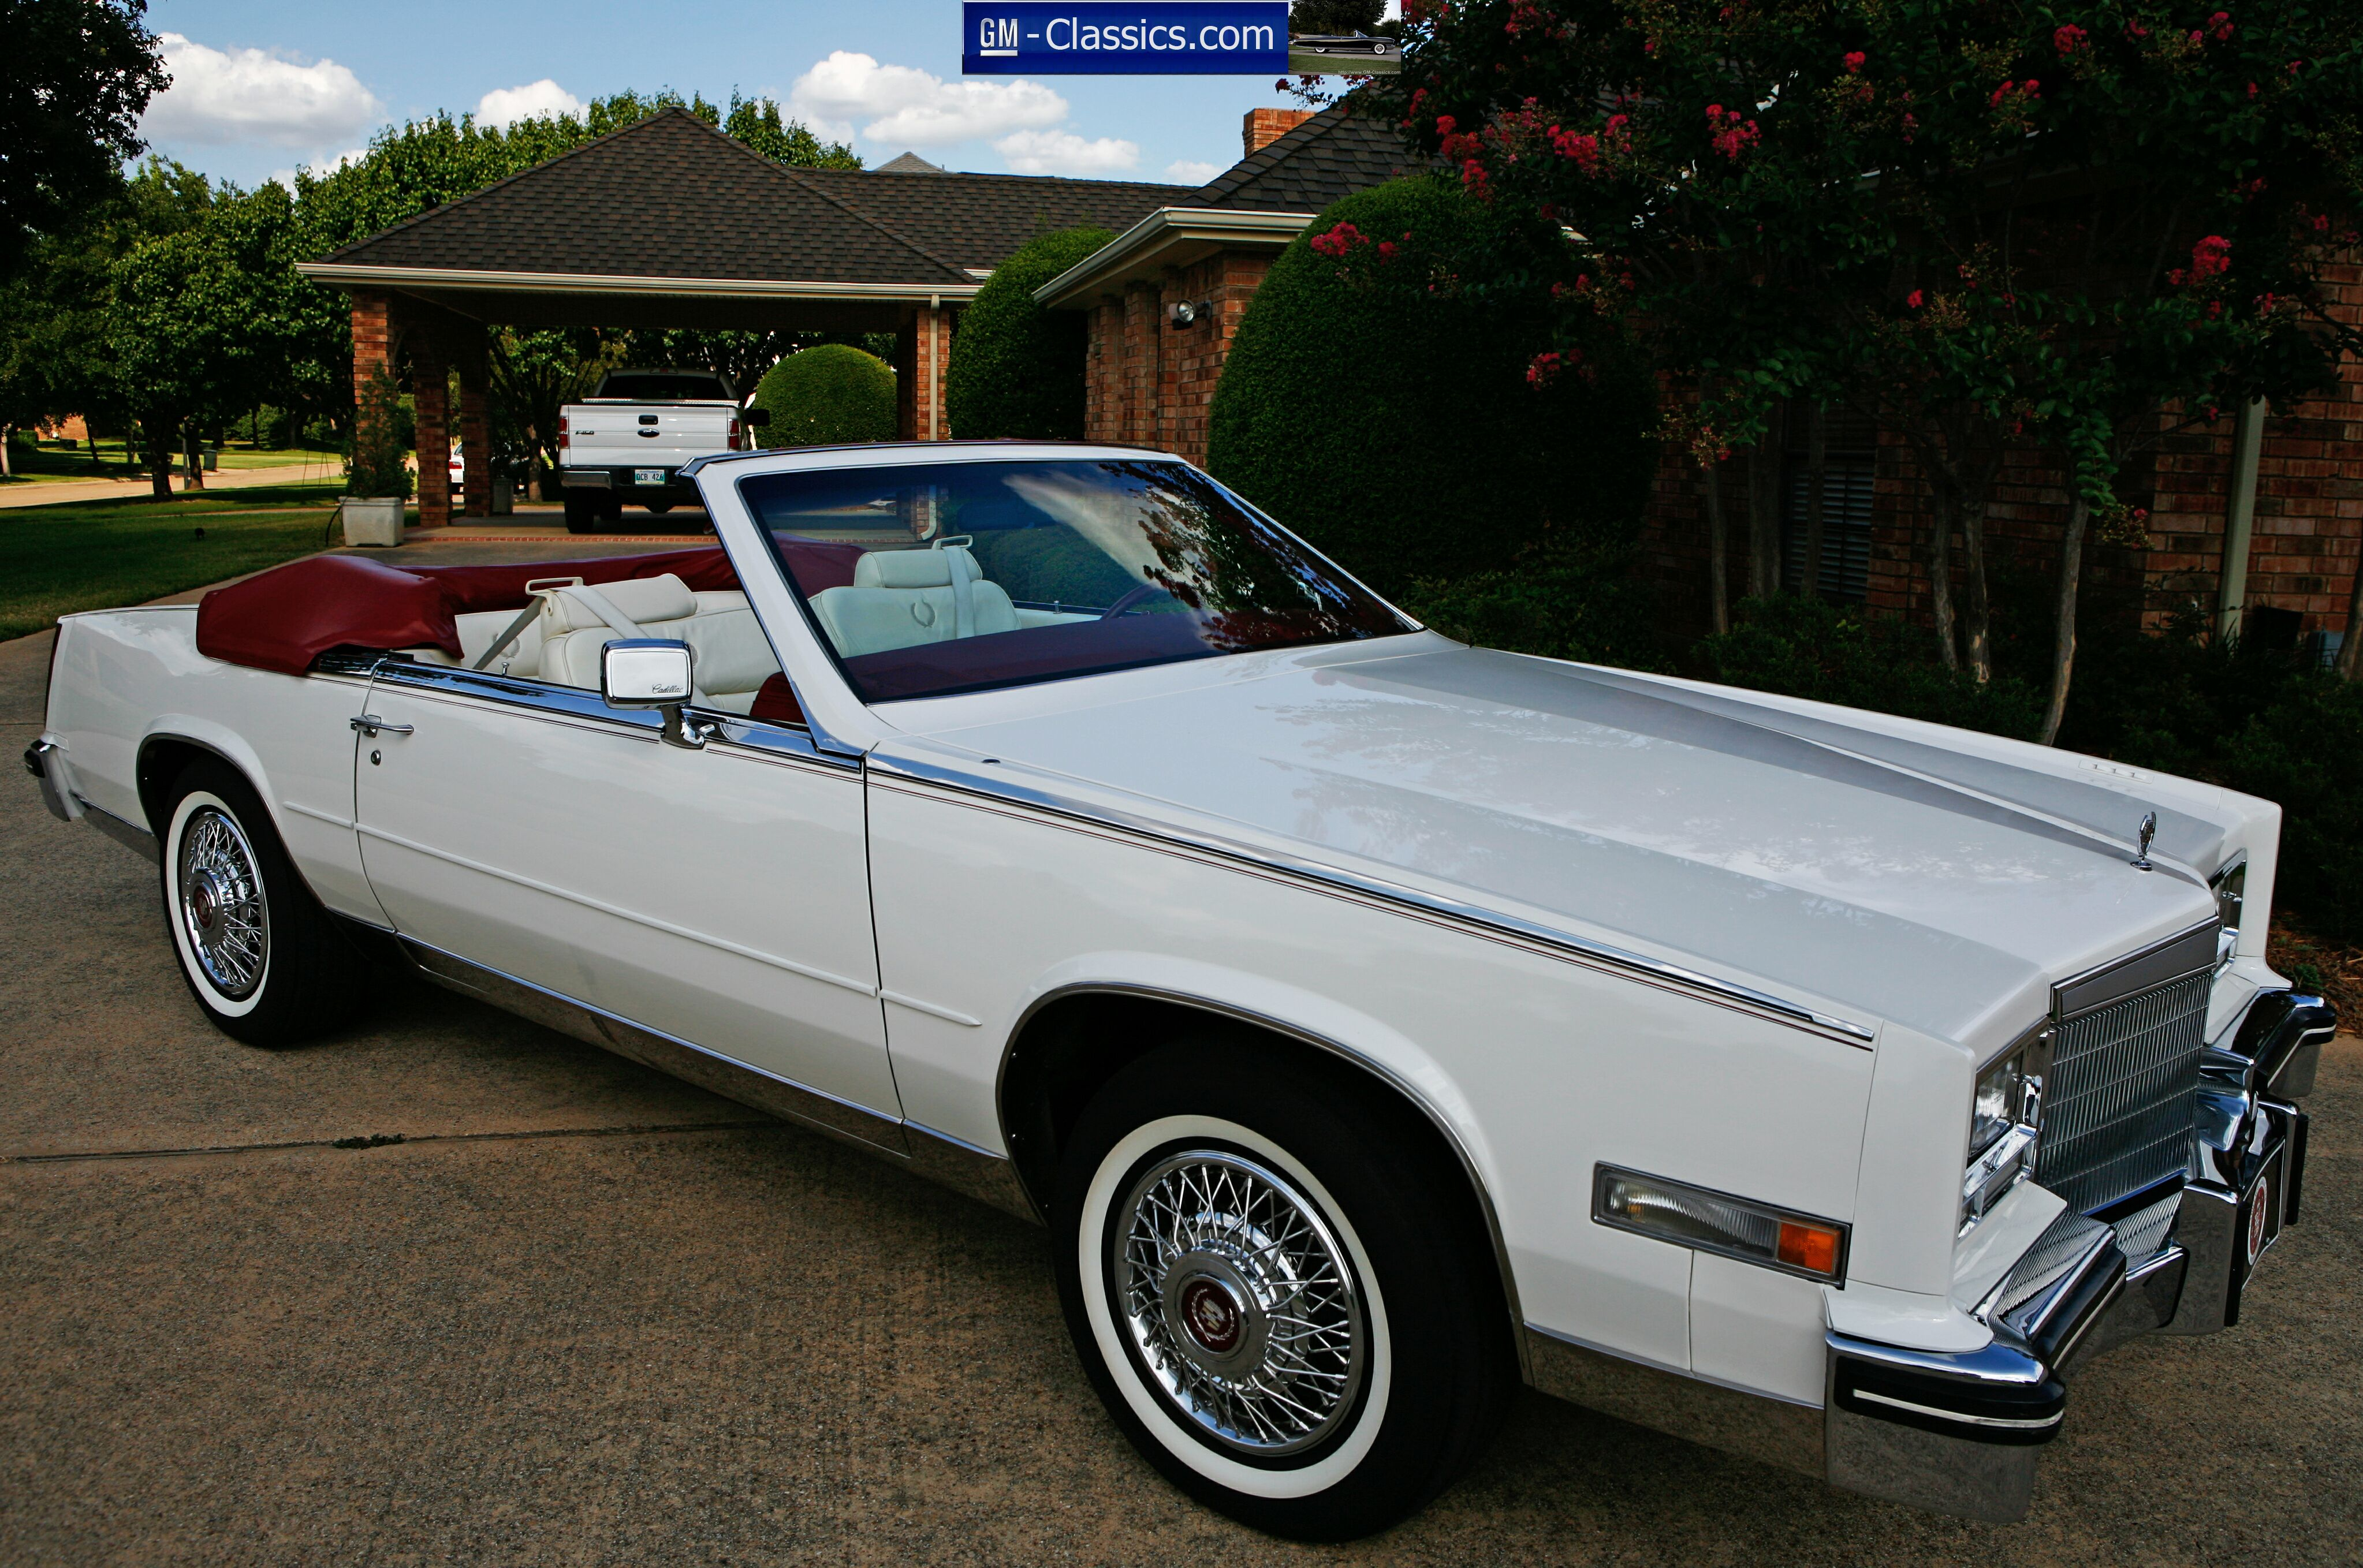 1984 Cadillac Eldorado Convertible - Matt Garrett